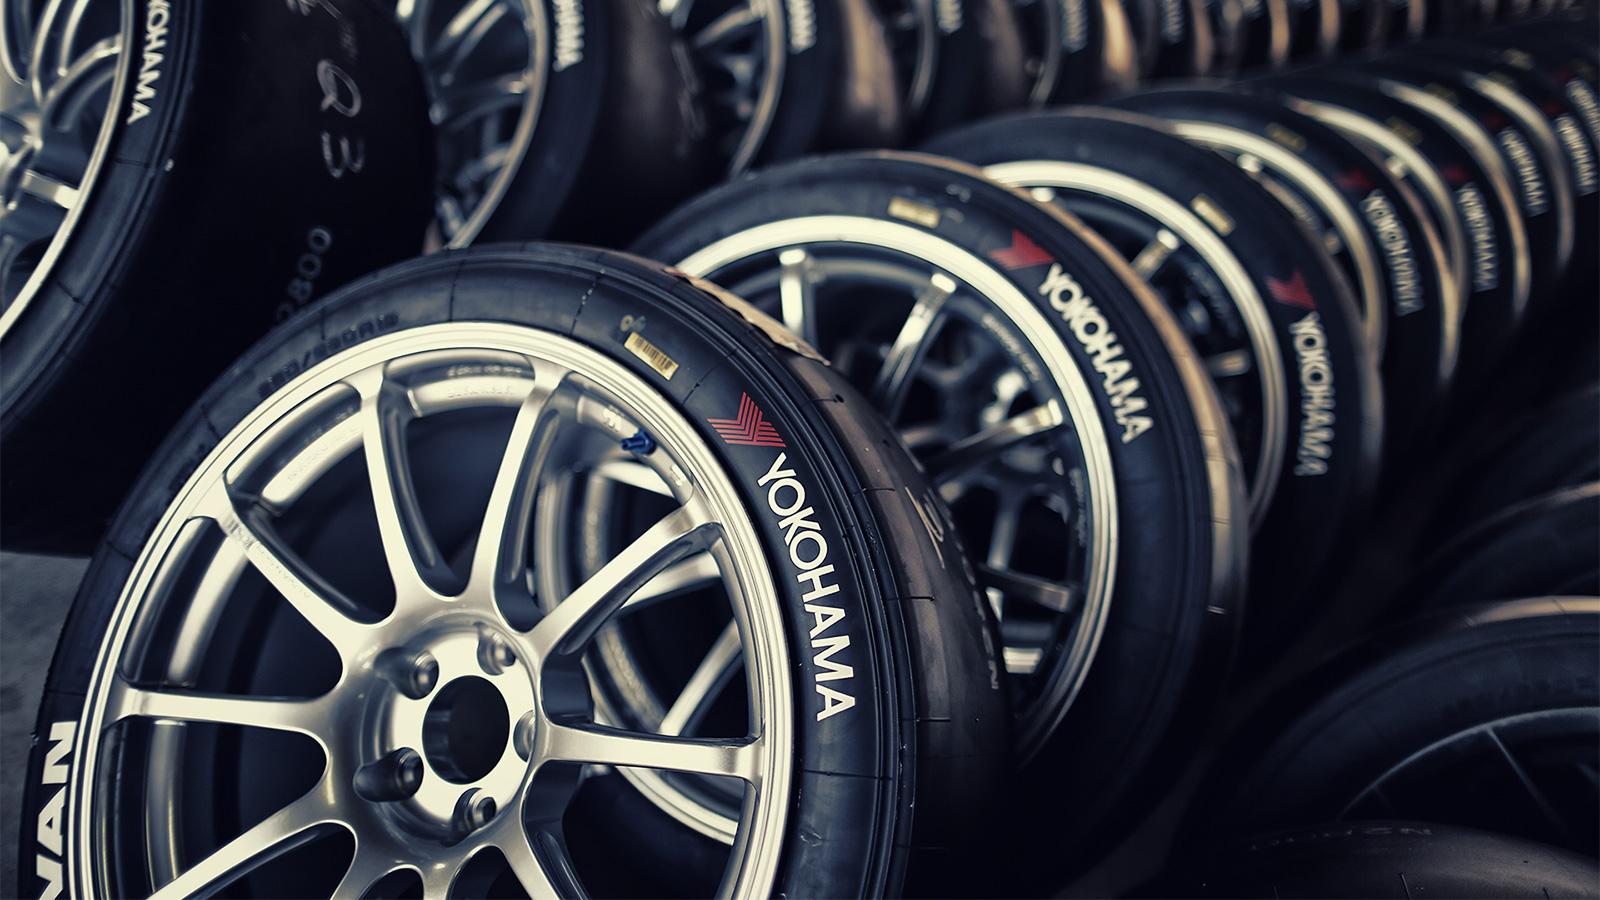 Yokohama was chosen thanks to its long association with Touring Car racing.